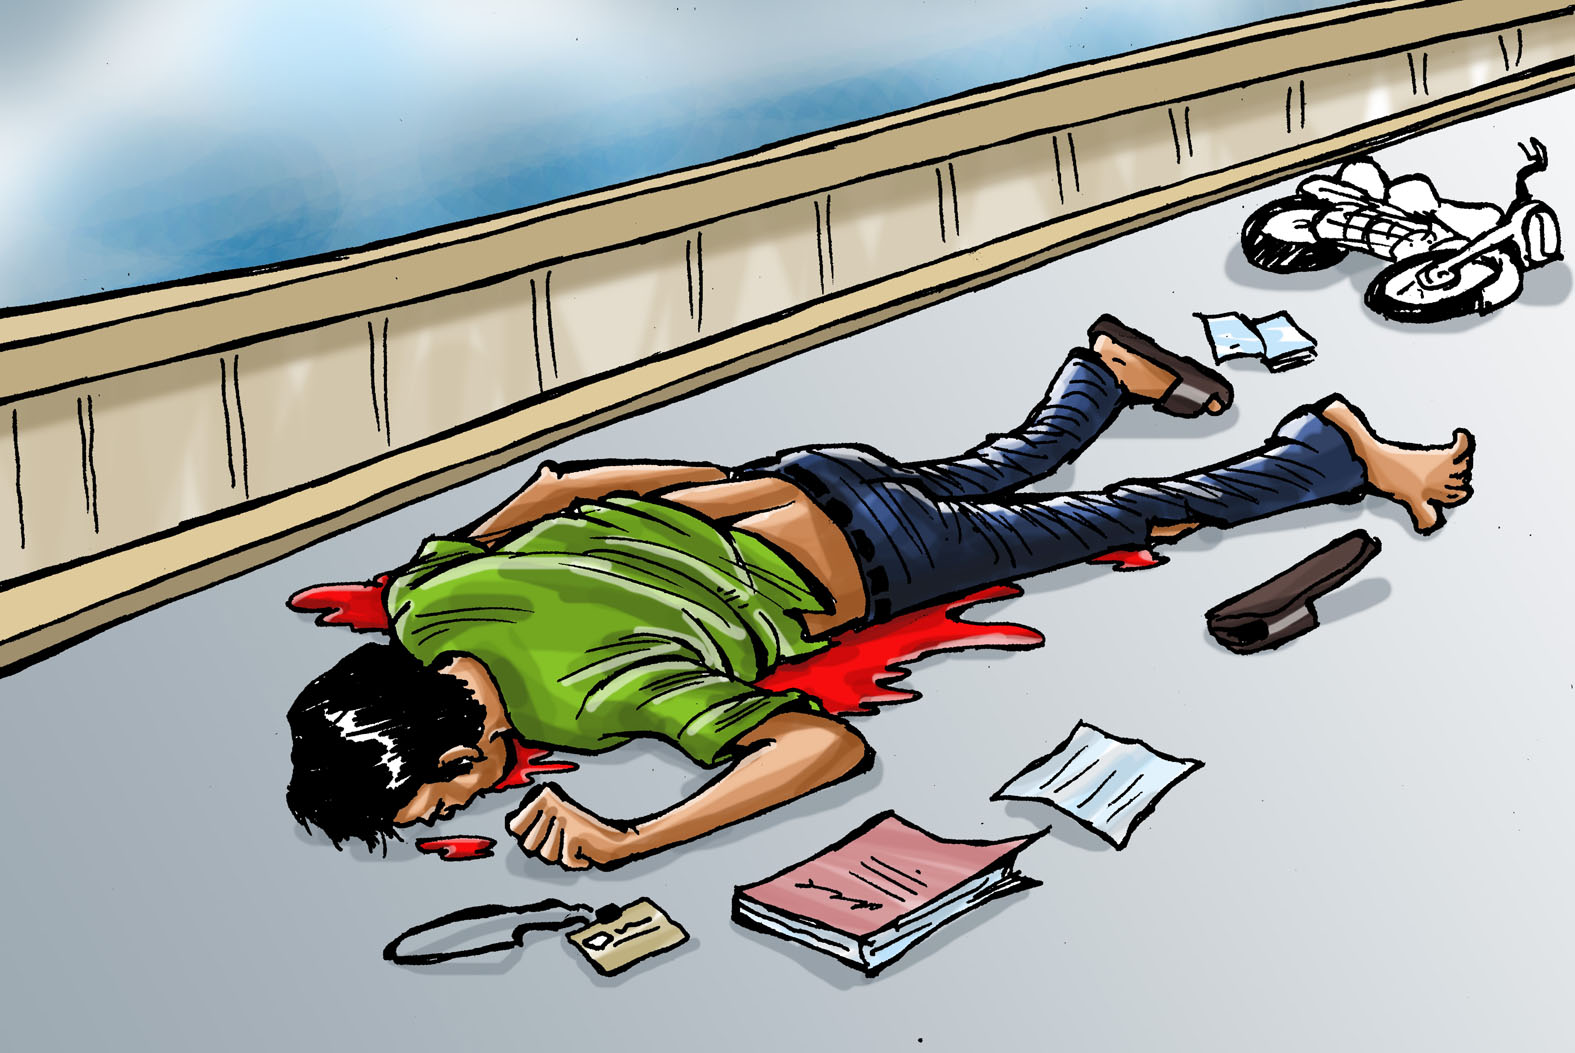 accident cartoon cliparts co car accident clipart free car accident clipart black and white